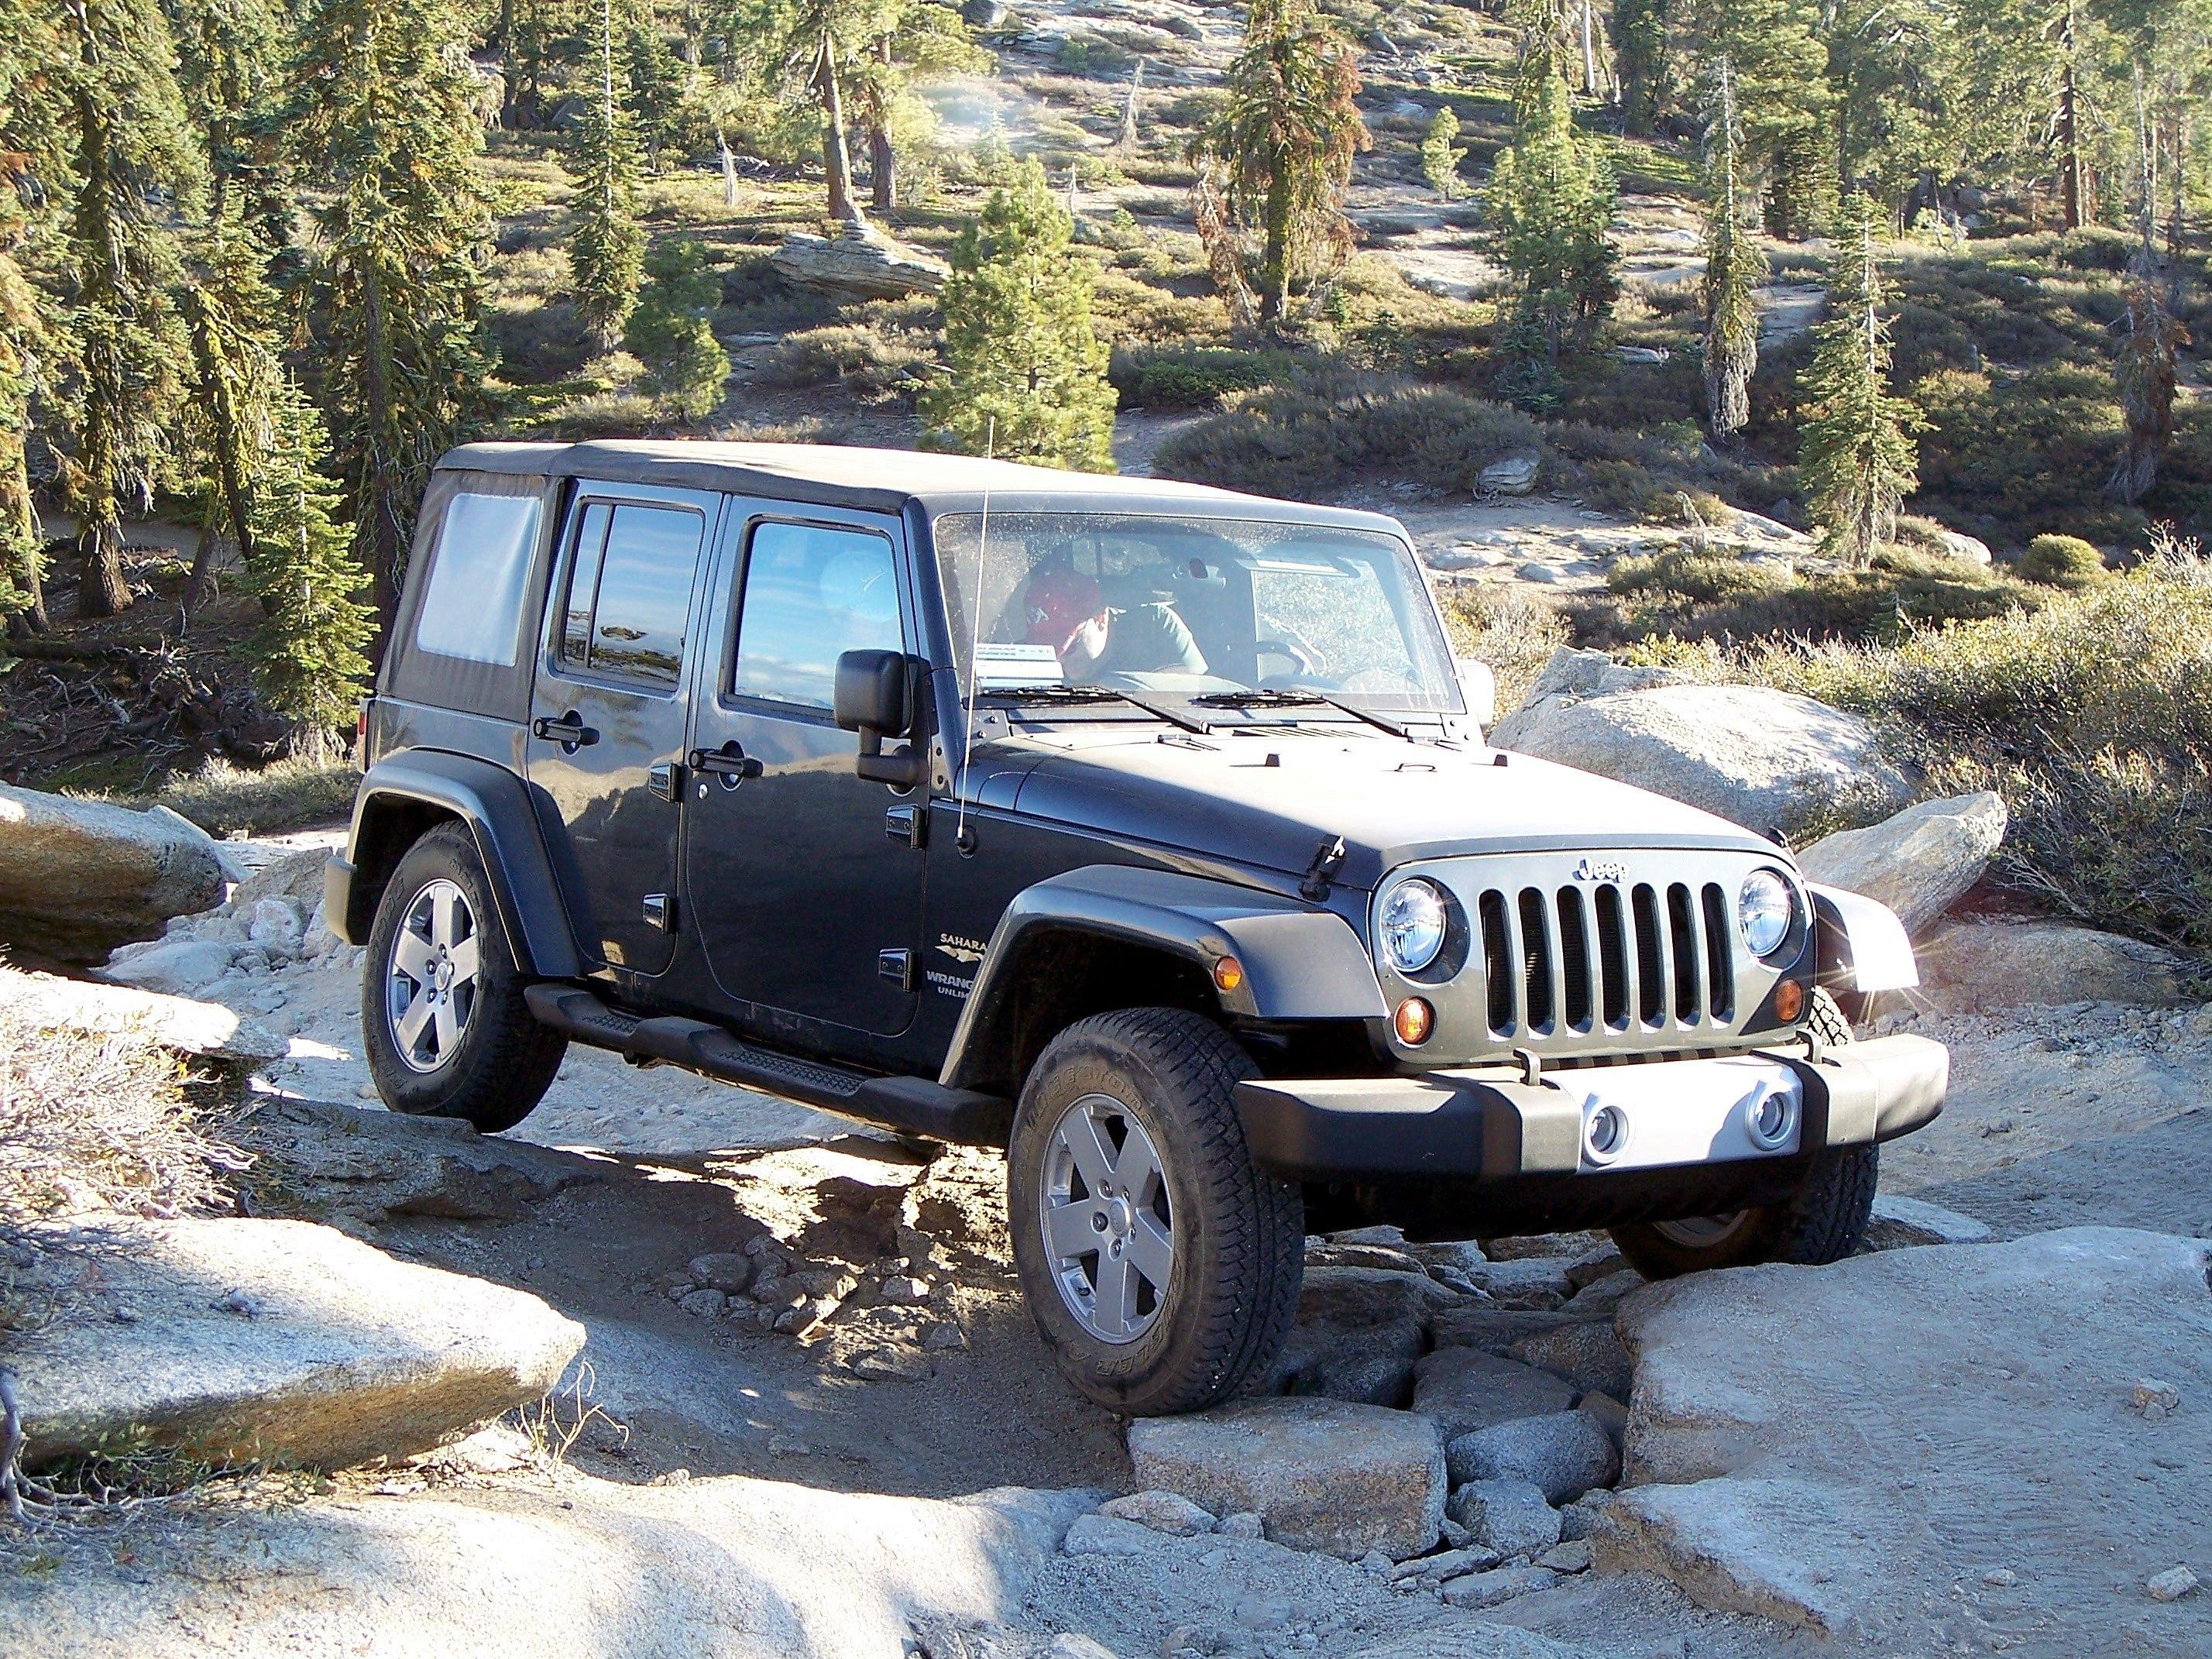 2017 Jeep Wrangler Mpg >> 2017 Jeep Wrangler Fuel Economy Driven Jeep News Jeep Wrangler